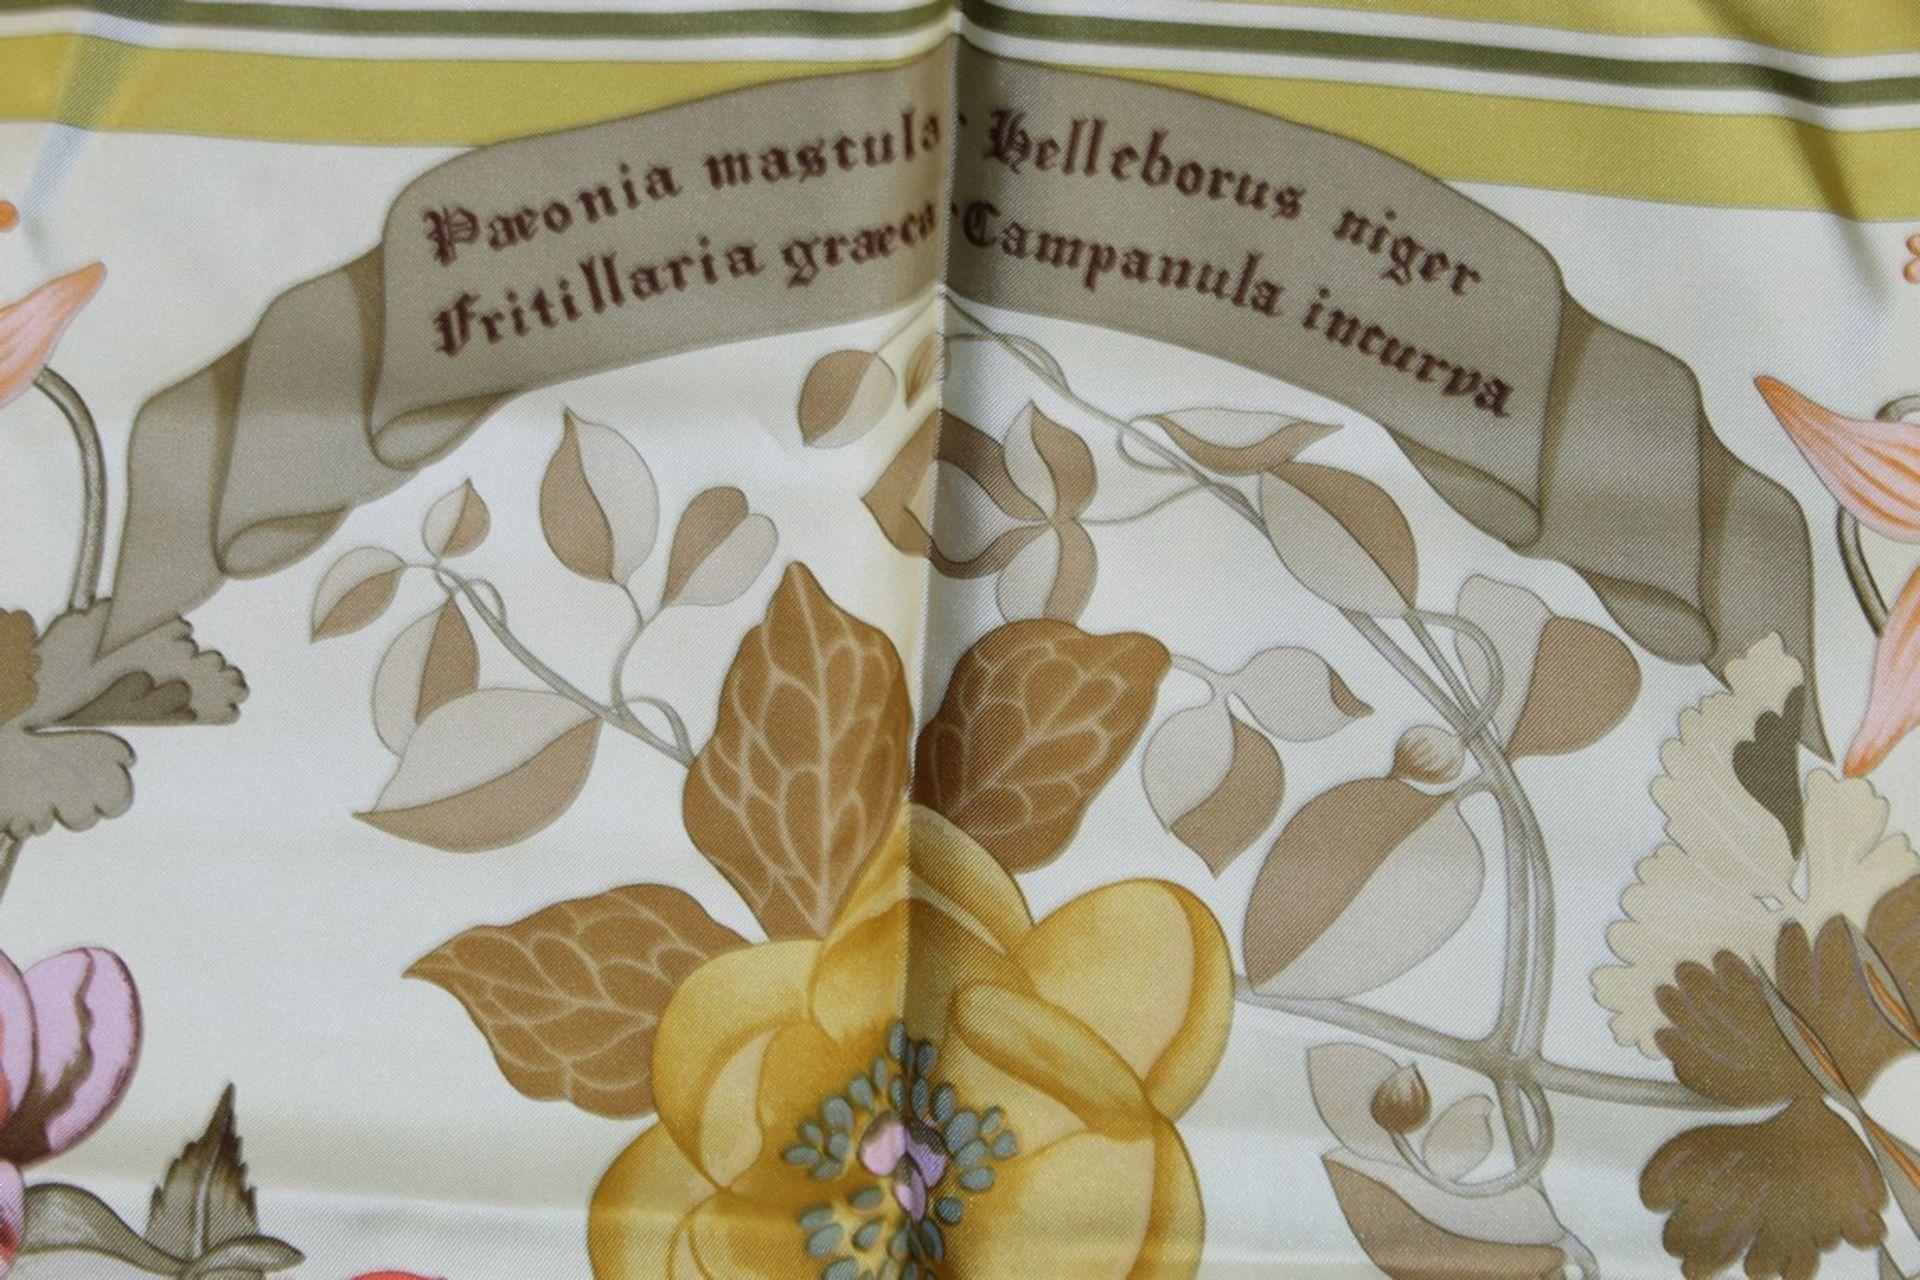 RRP £680 Hermes 100% Twill Silk Scarf, Aquilegia Othonis By Niki Goulandris, Yellow/Green, 90X90Cm - Image 4 of 5